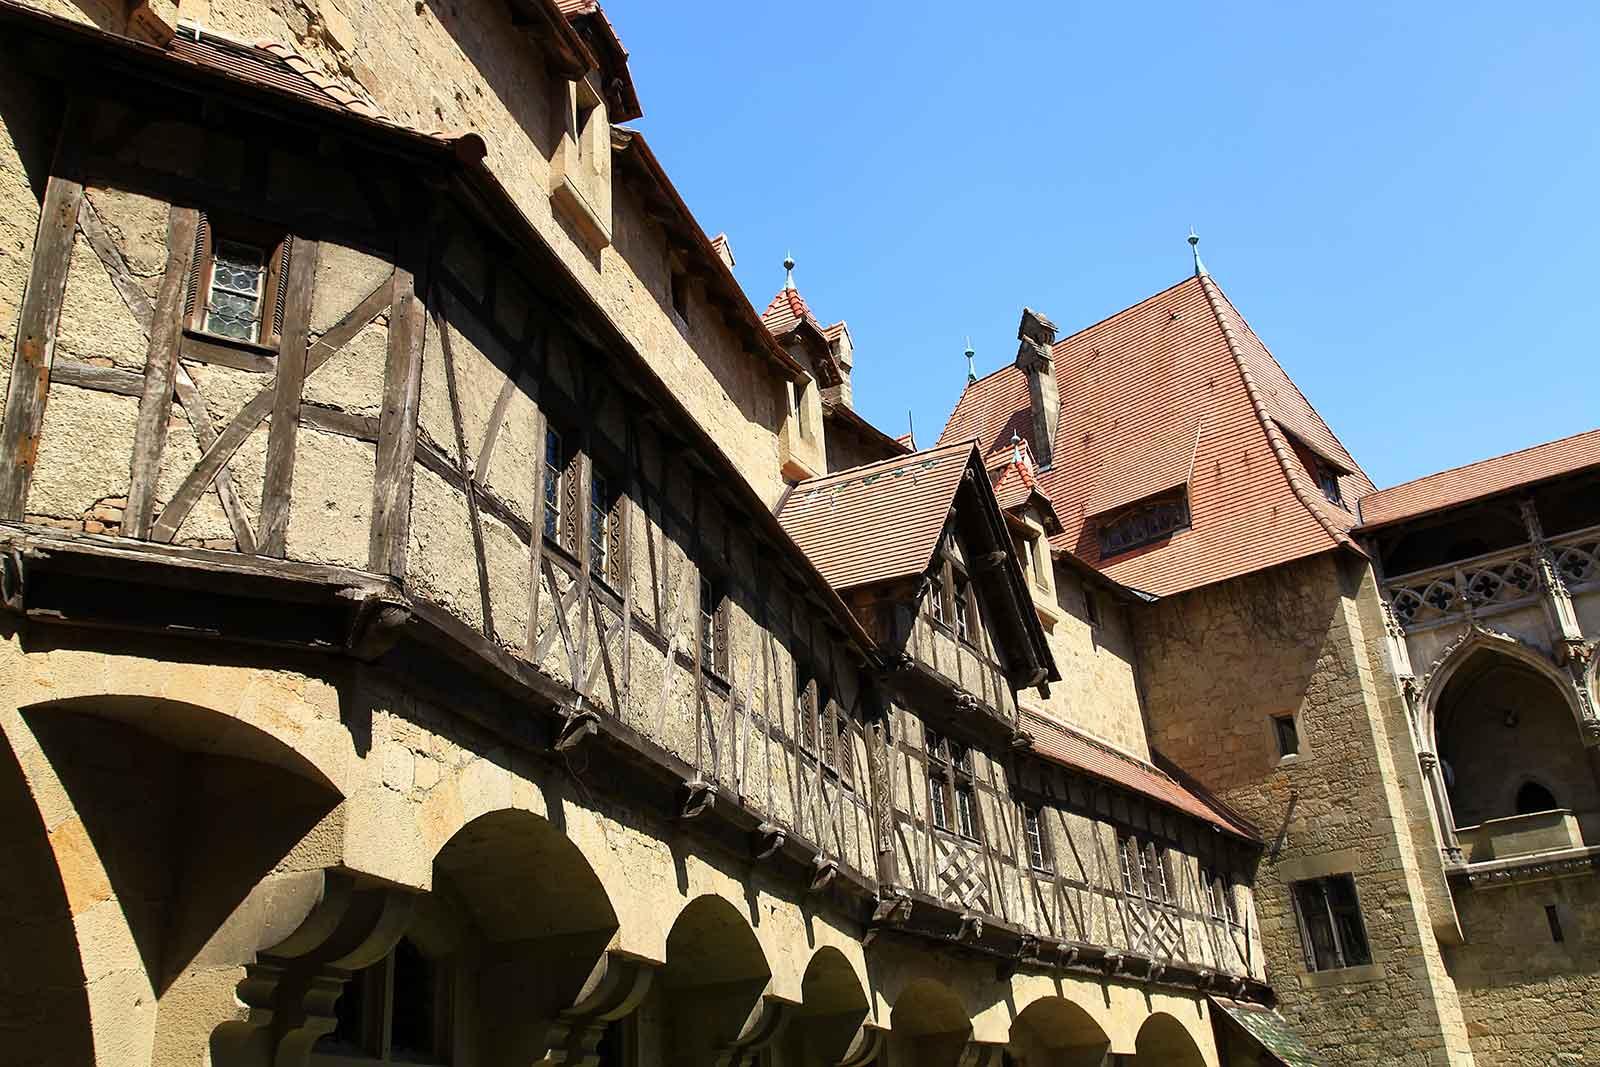 Imagine how knights used to live at Burg Kreuzenstein...